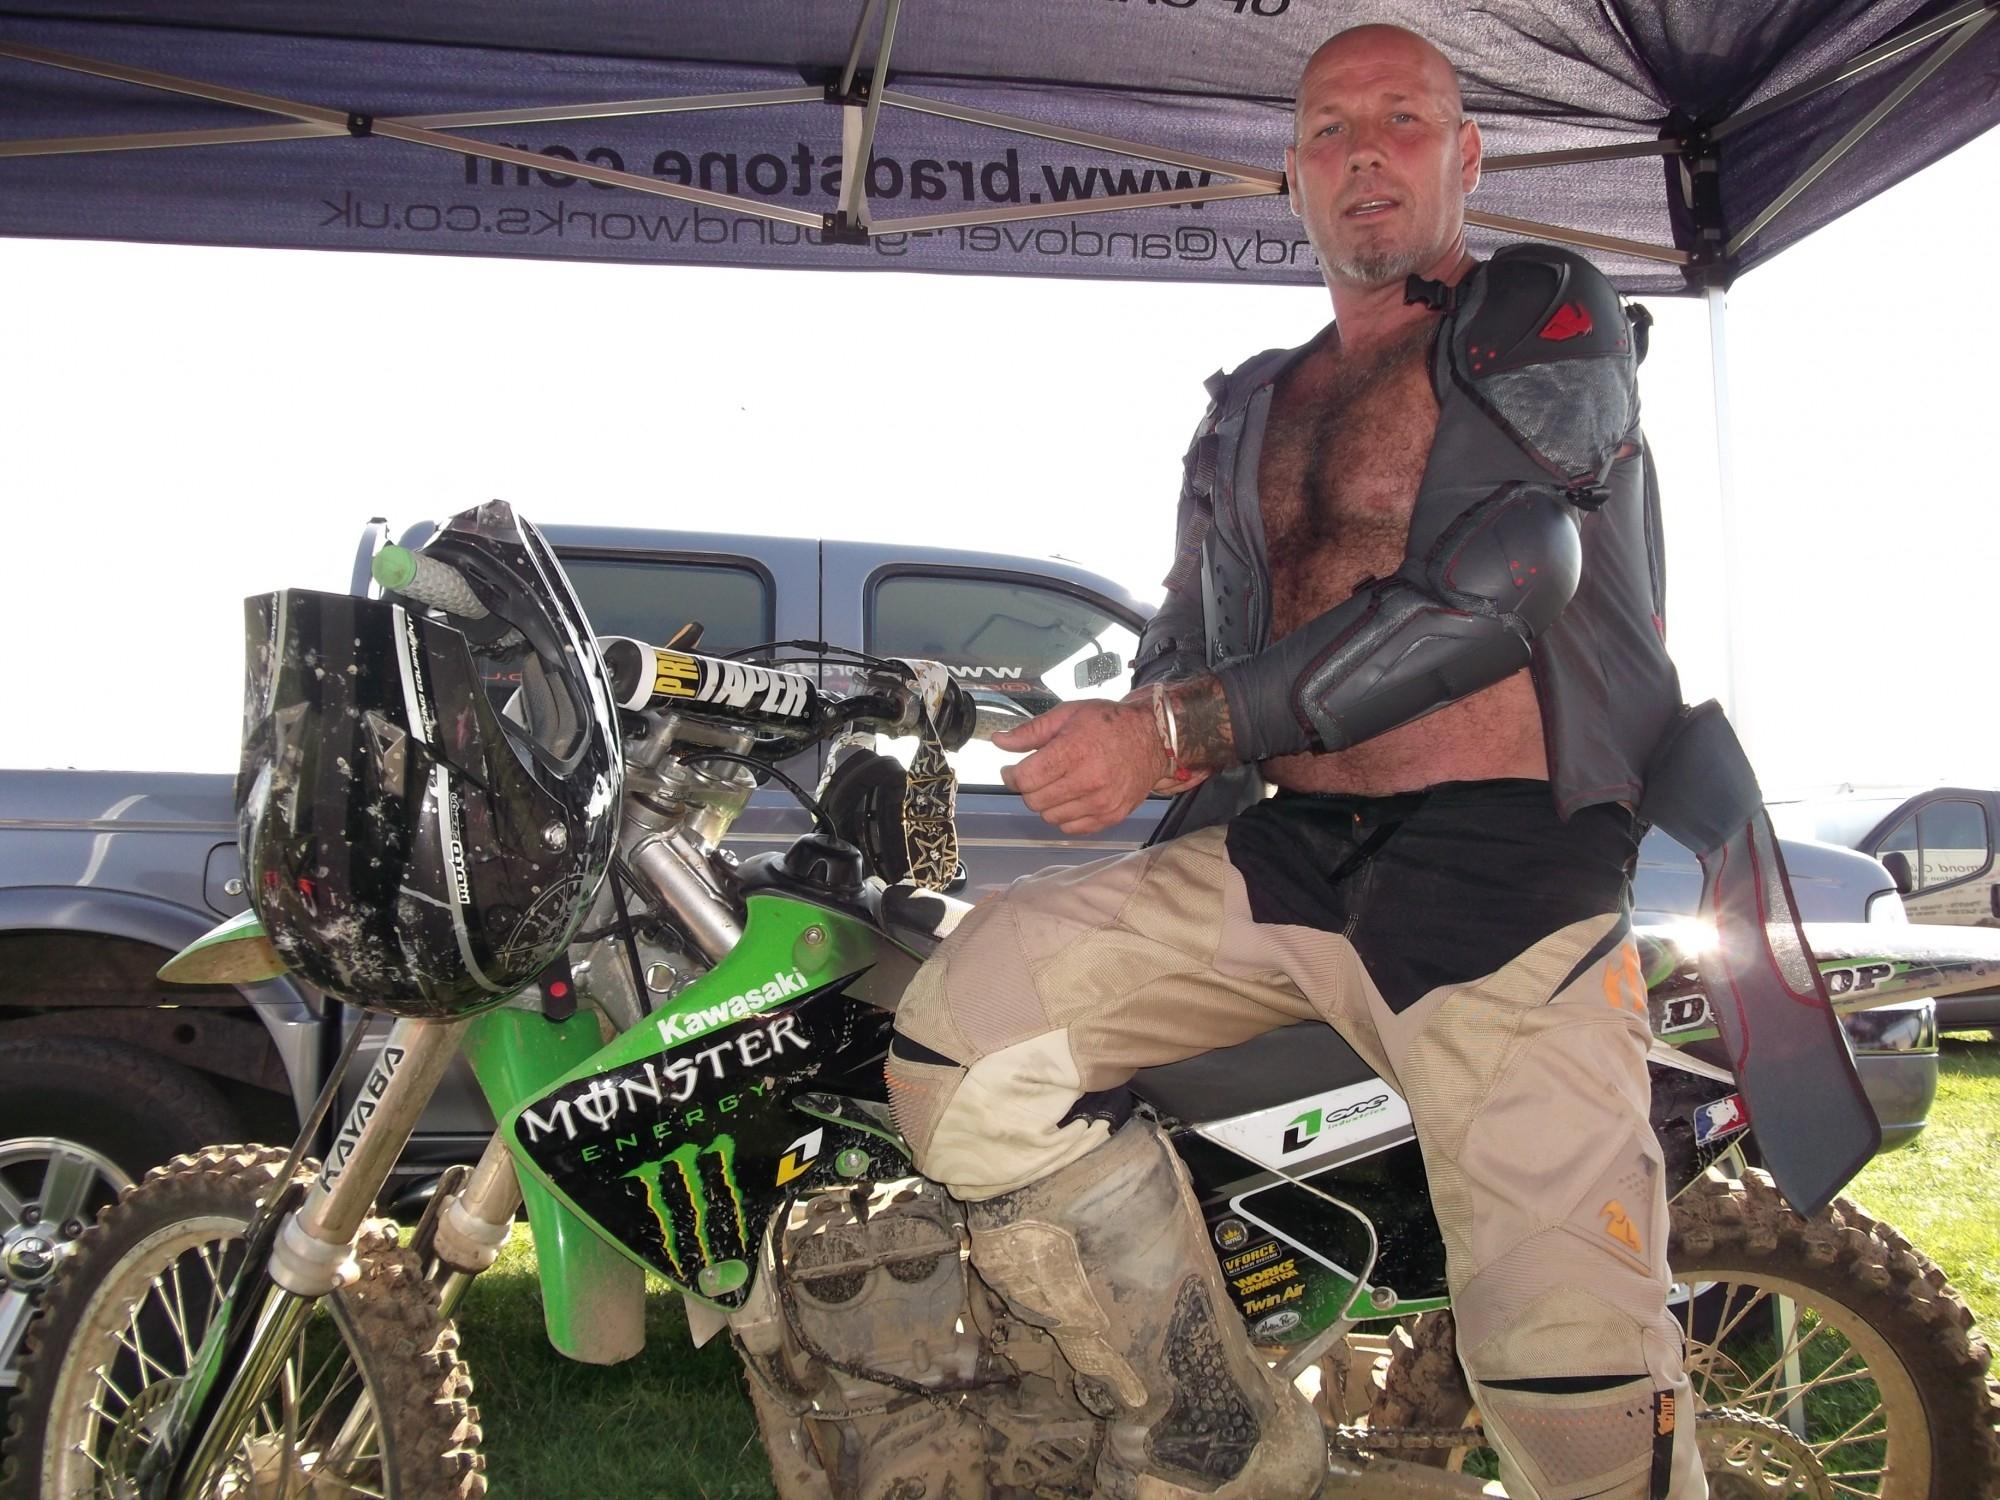 Andy mac profile picture.